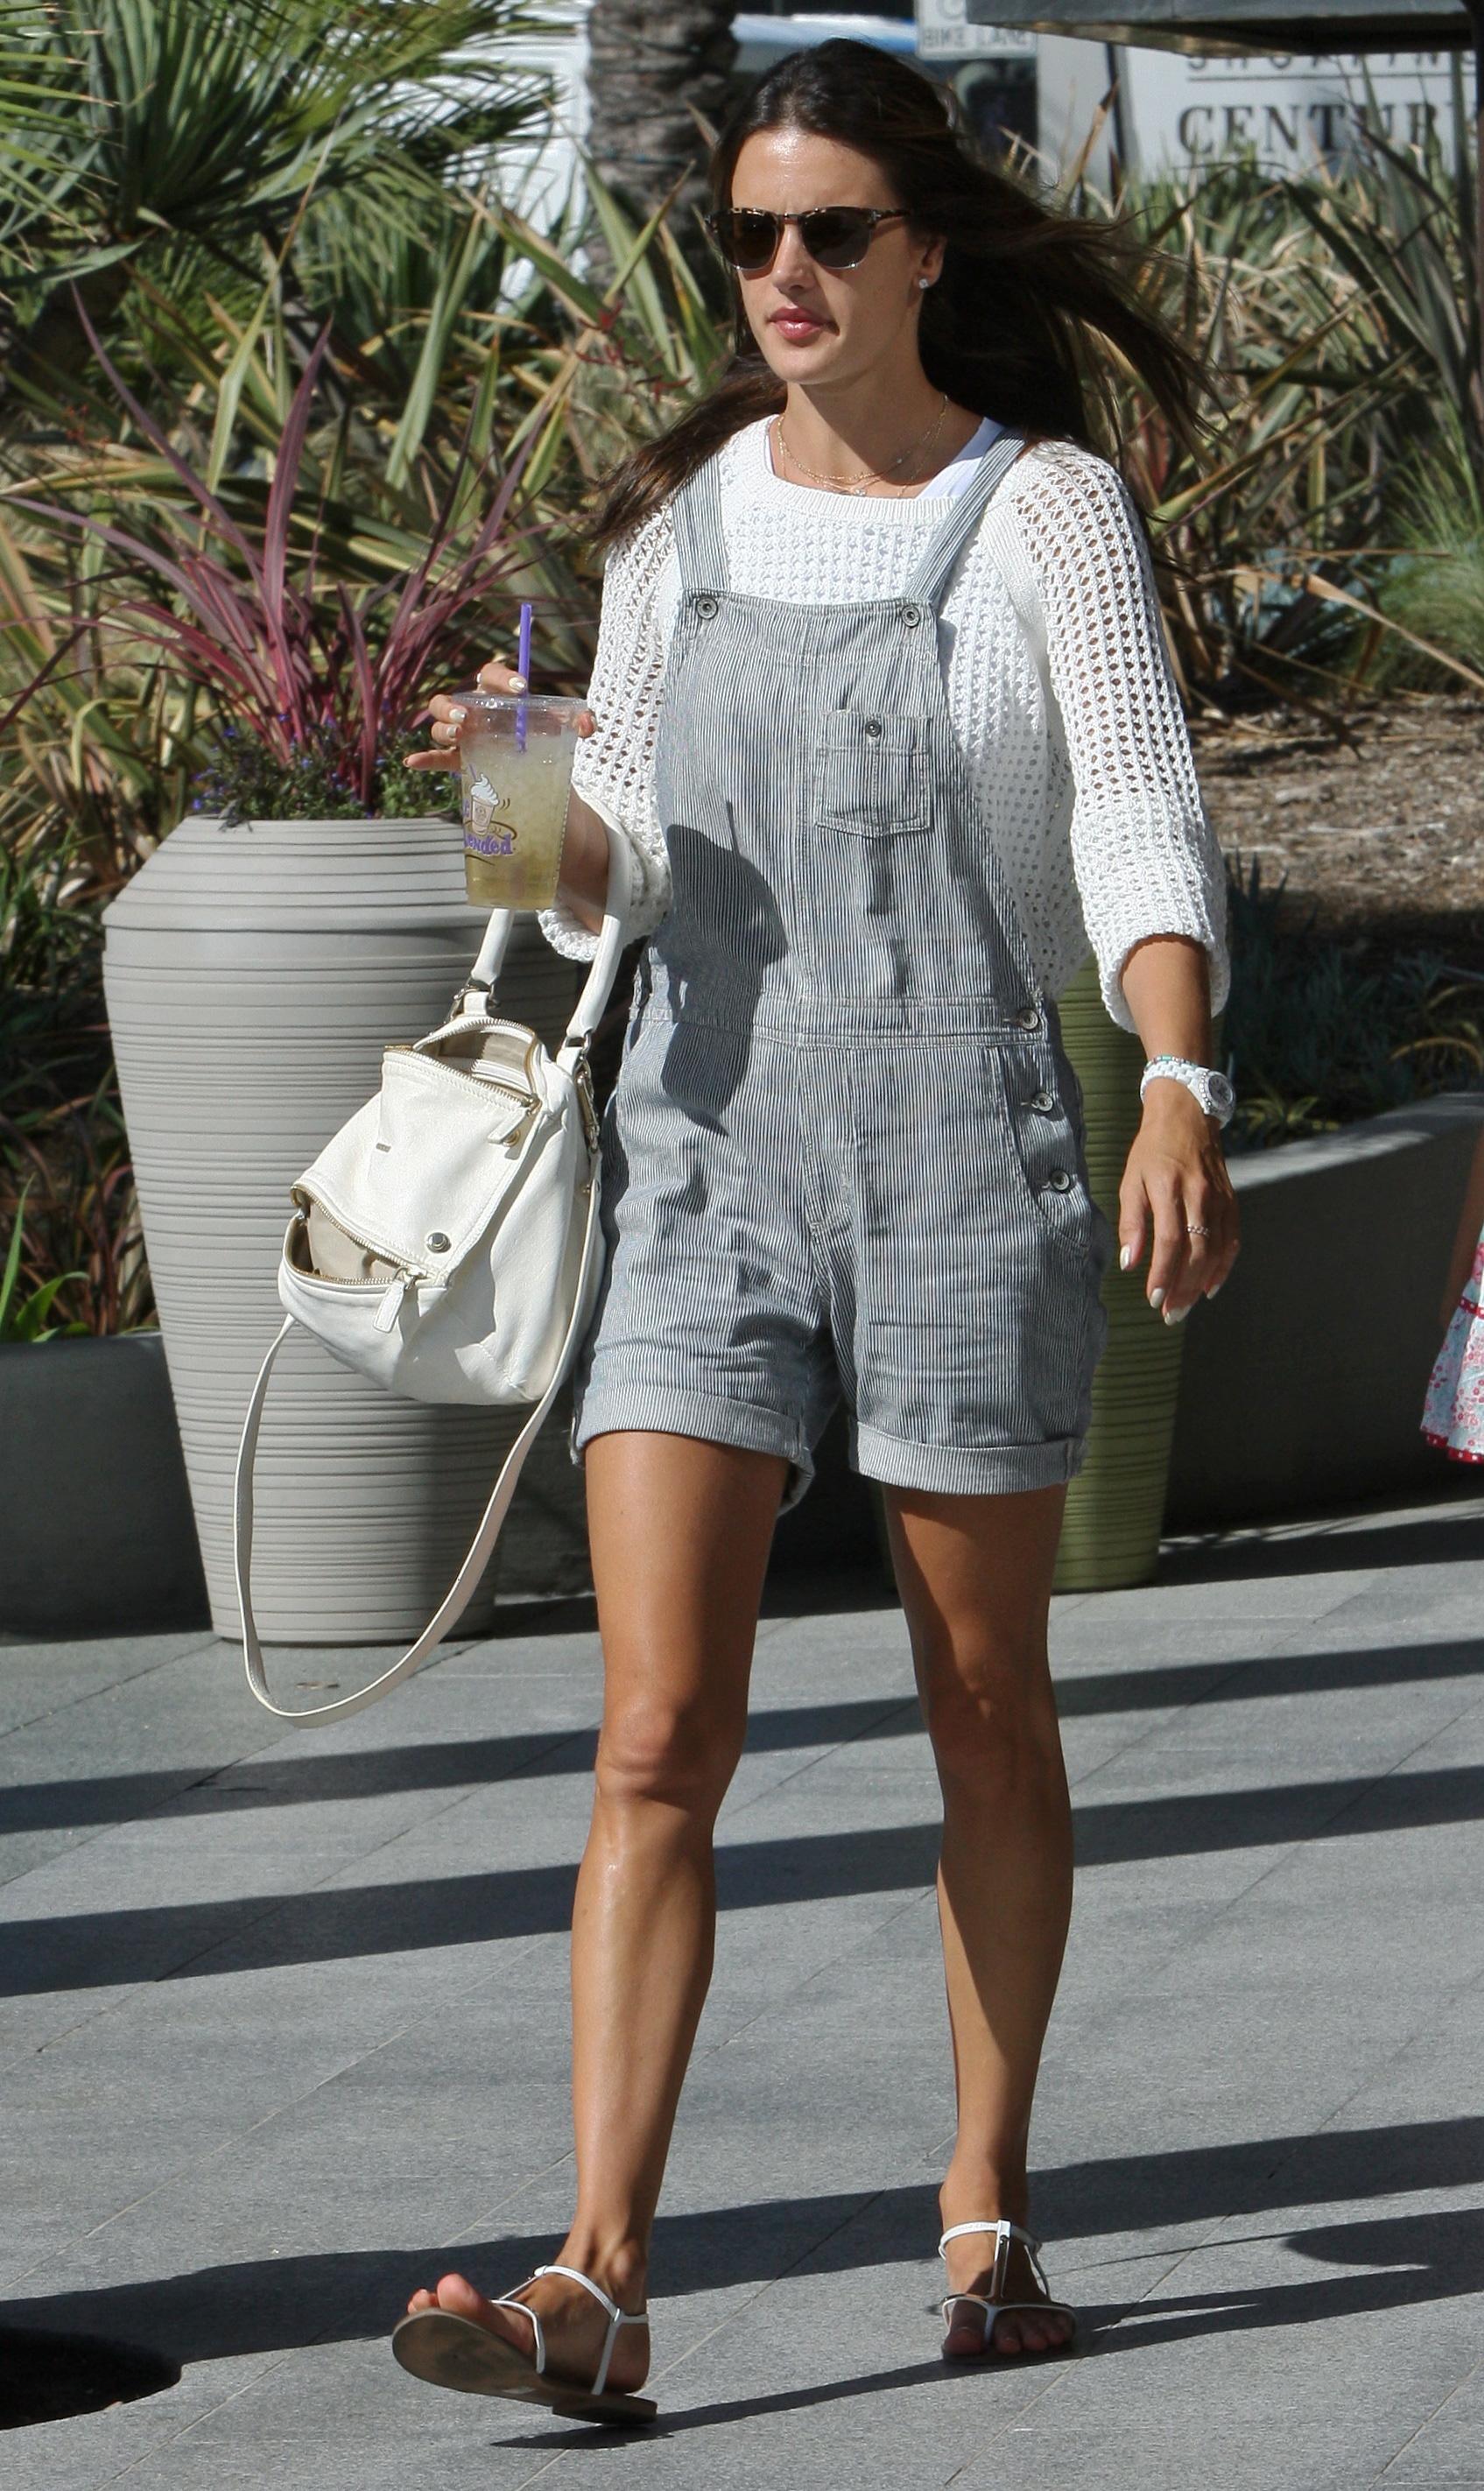 Alessandra Ambrosio wearing overalls